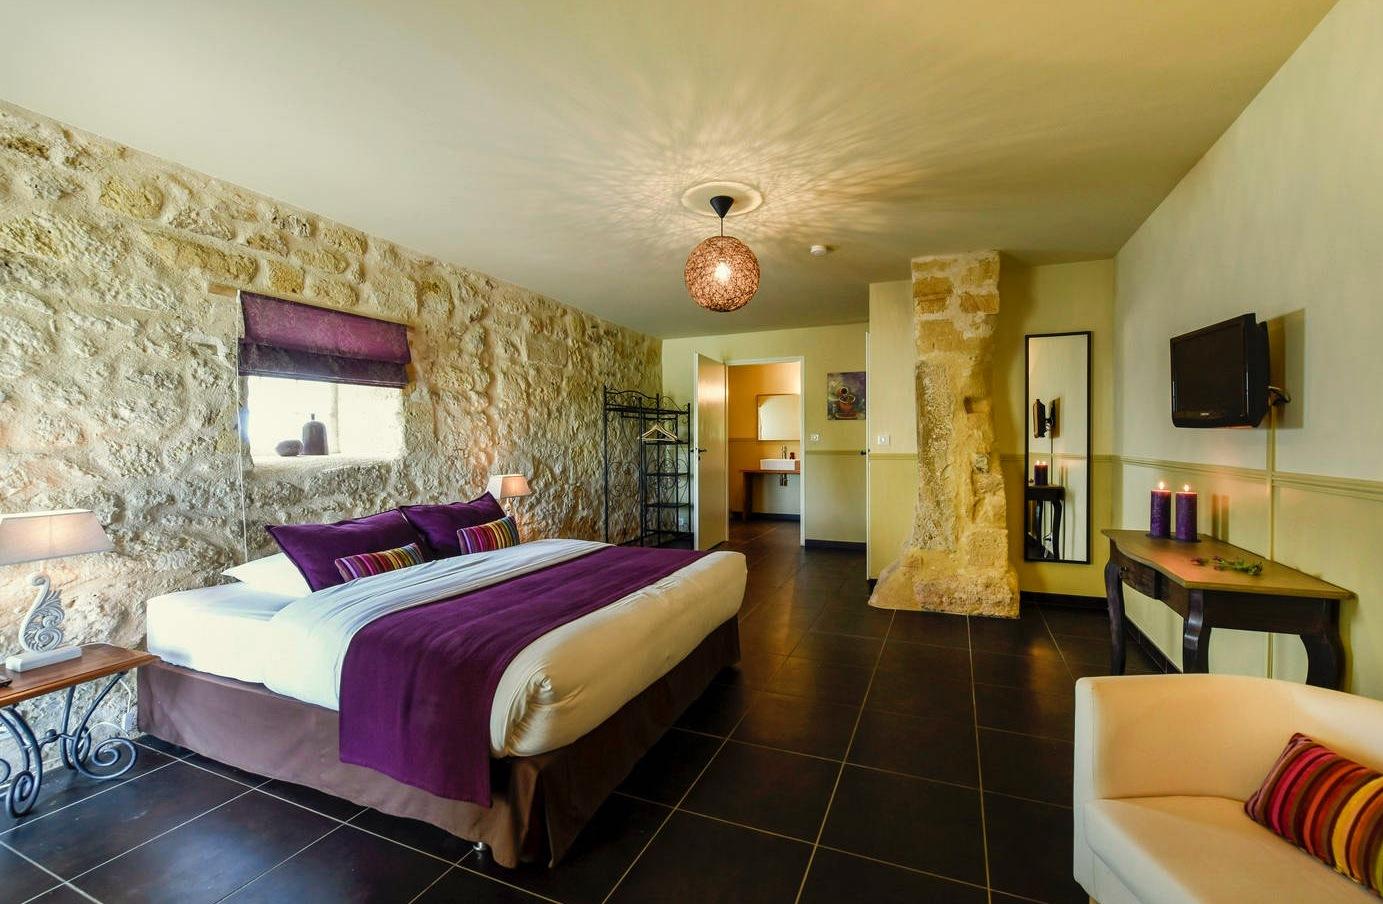 Nos chambres d'hôtes et tarifs   bleu raisin